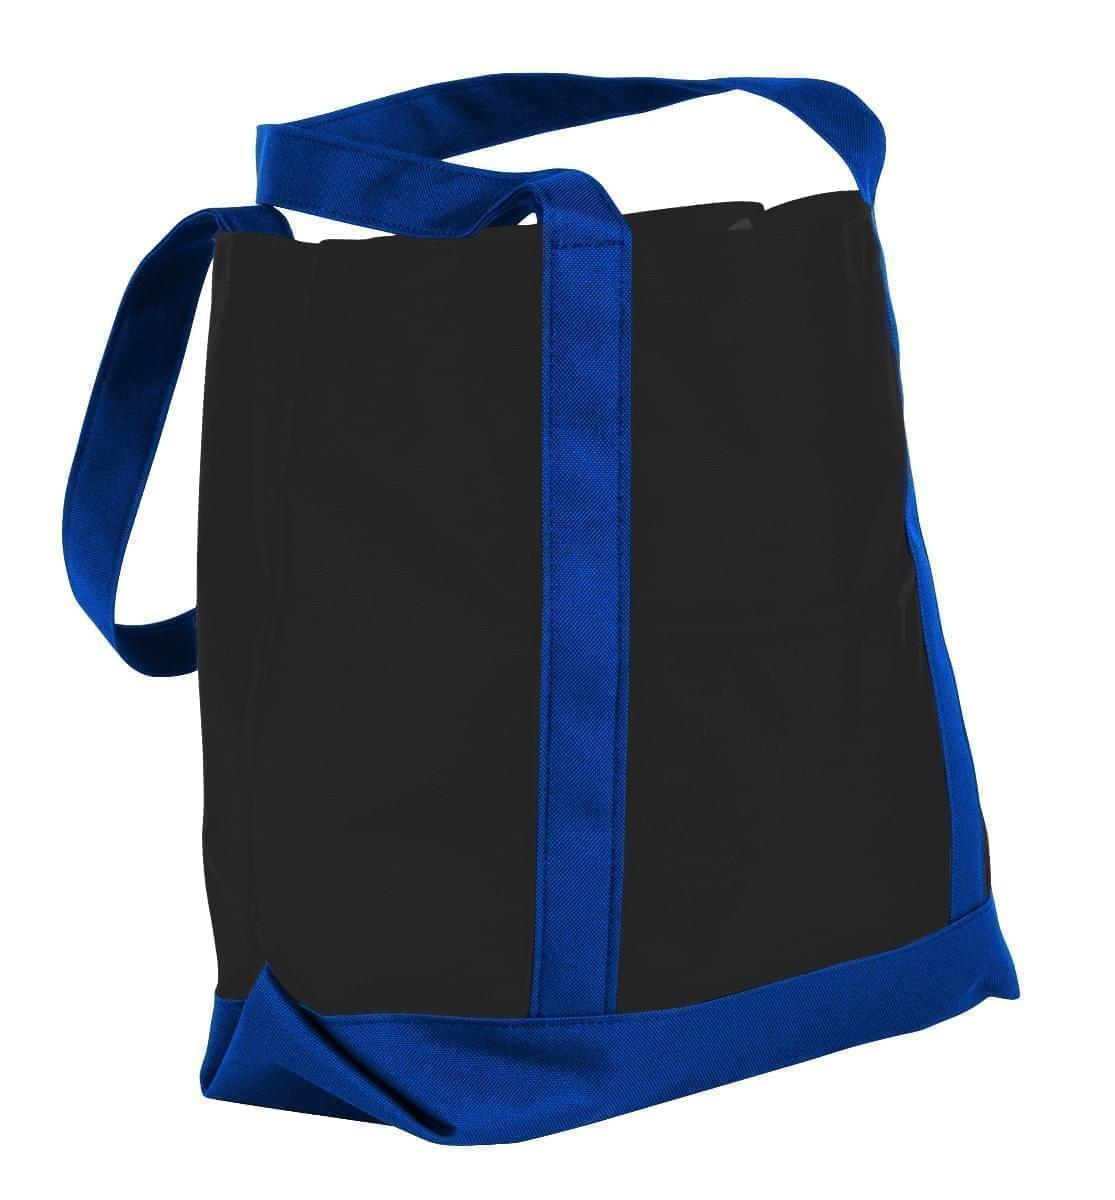 USA Made Canvas Fashion Tote Bags, Black-Royal Blue, XAACL1UAHM